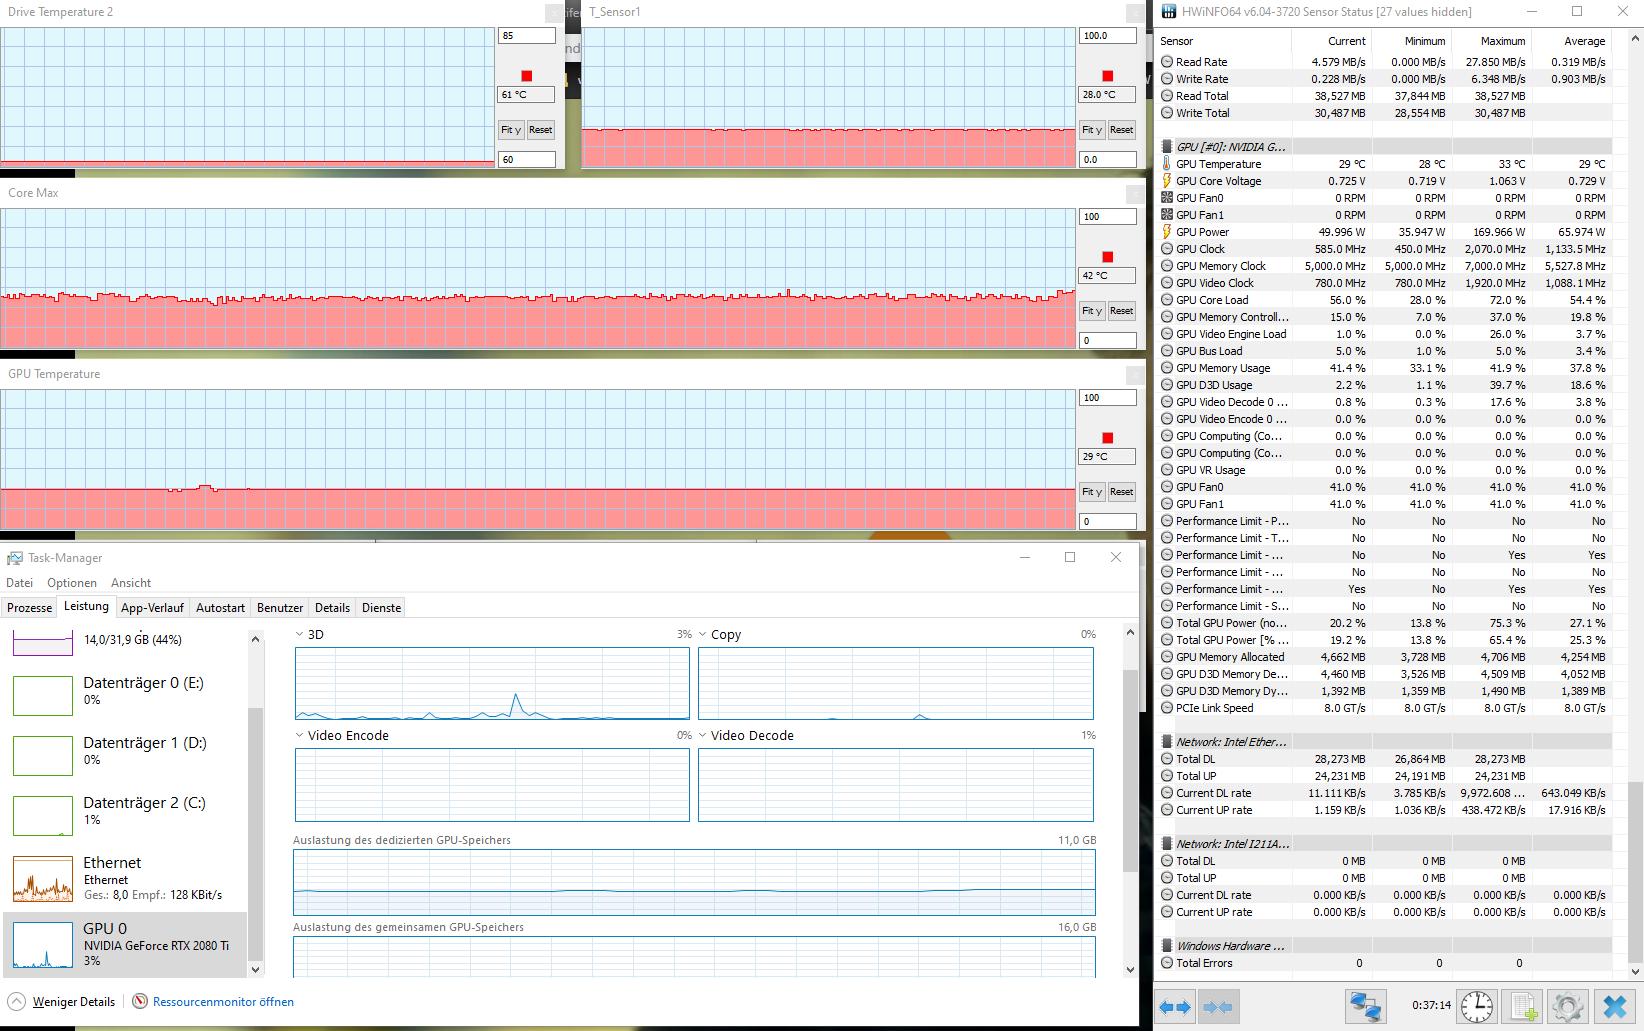 GPU drops to powersave/desktop clocks on Boss week · Issue